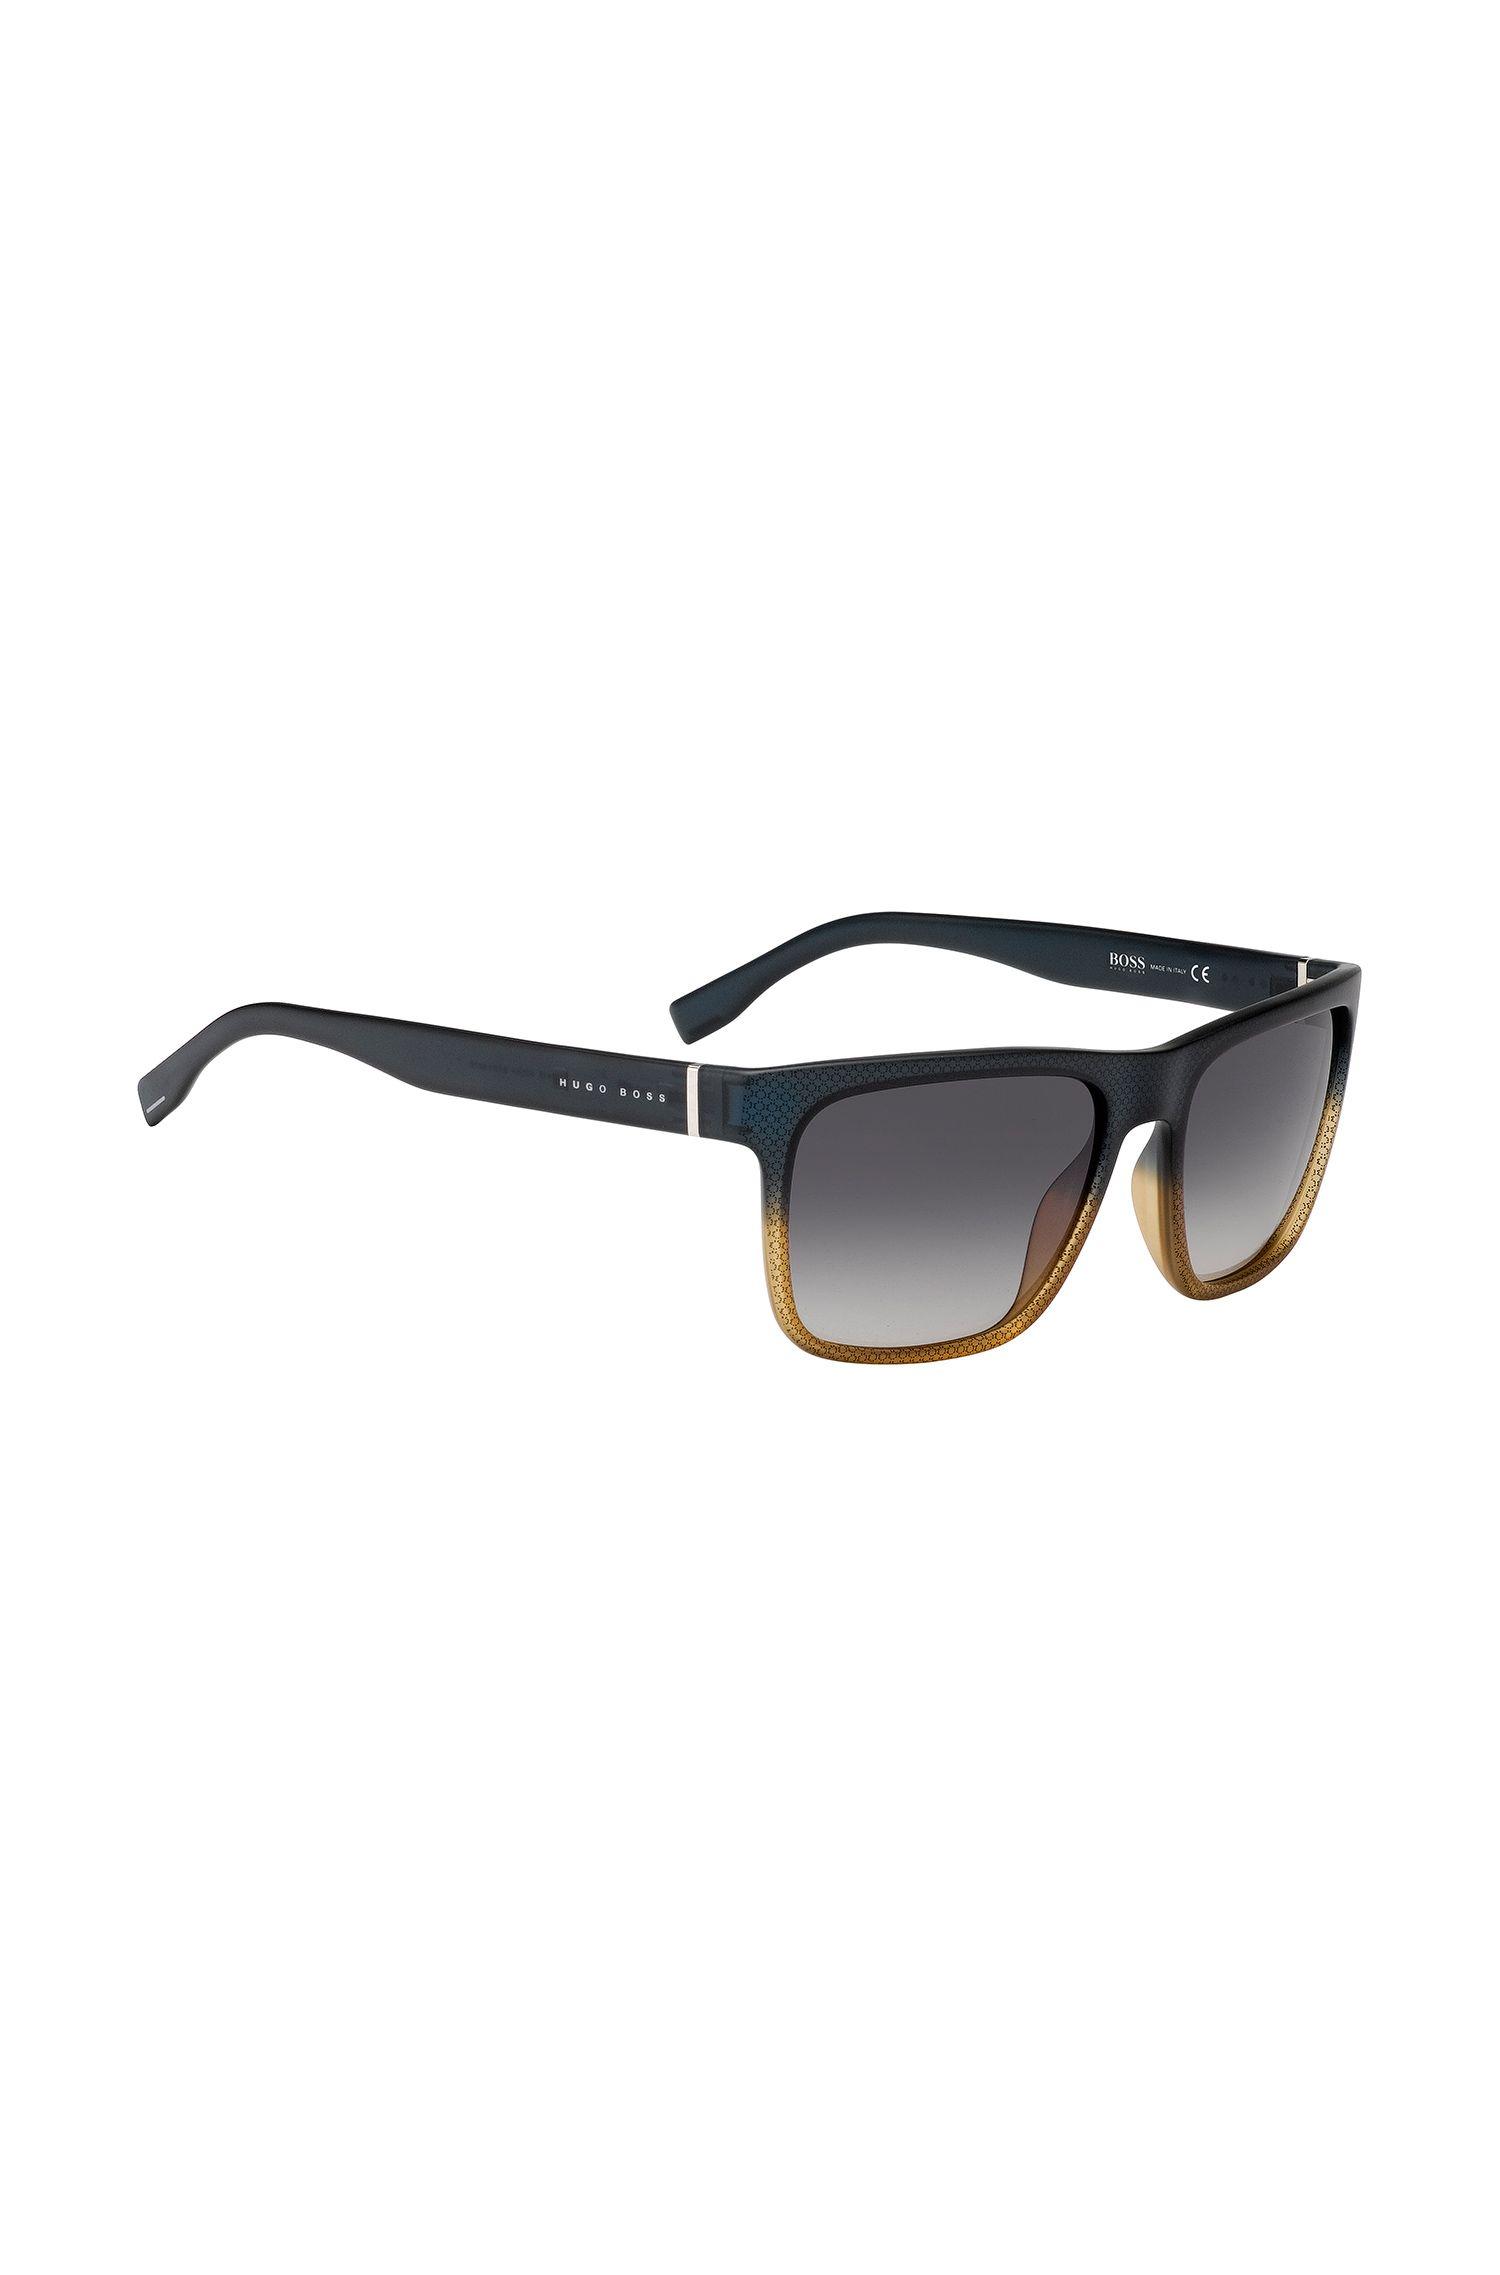 Gafas de sol: 'BOSS 0727/S'